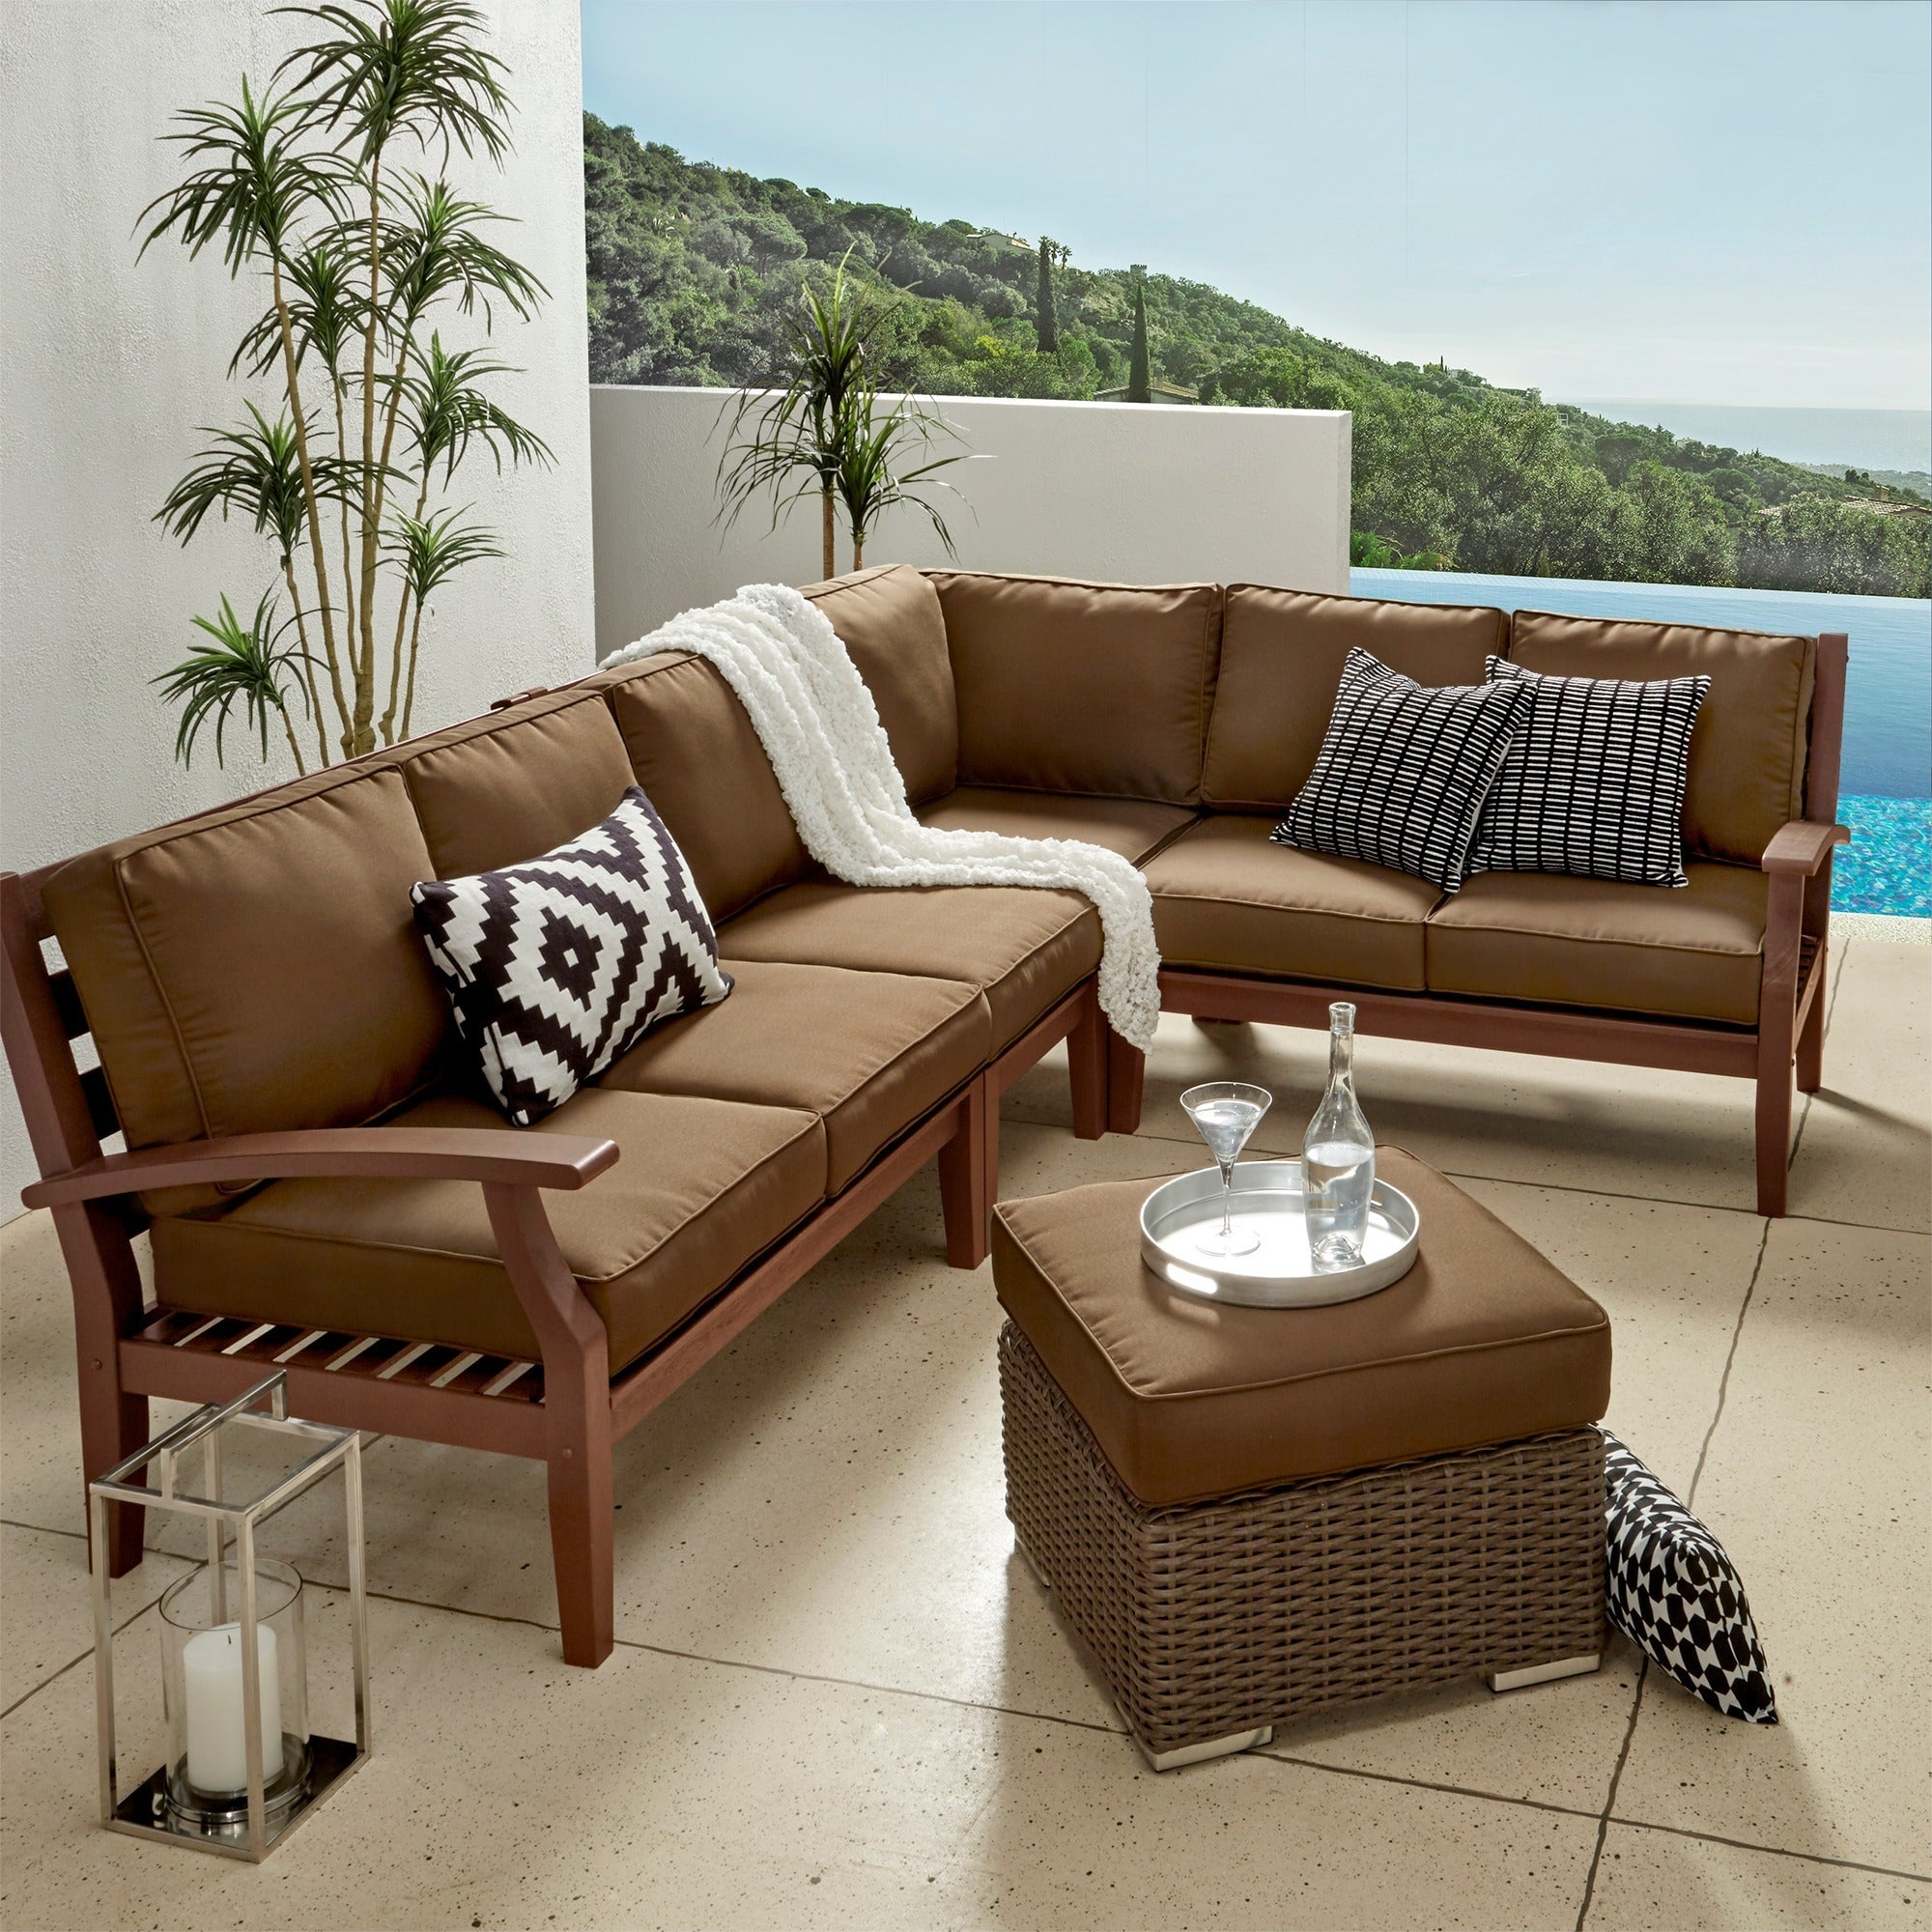 Shop Yasawa Modern Brown Outdoor Cushioned Wood Sectional iNSPIRE Q ...